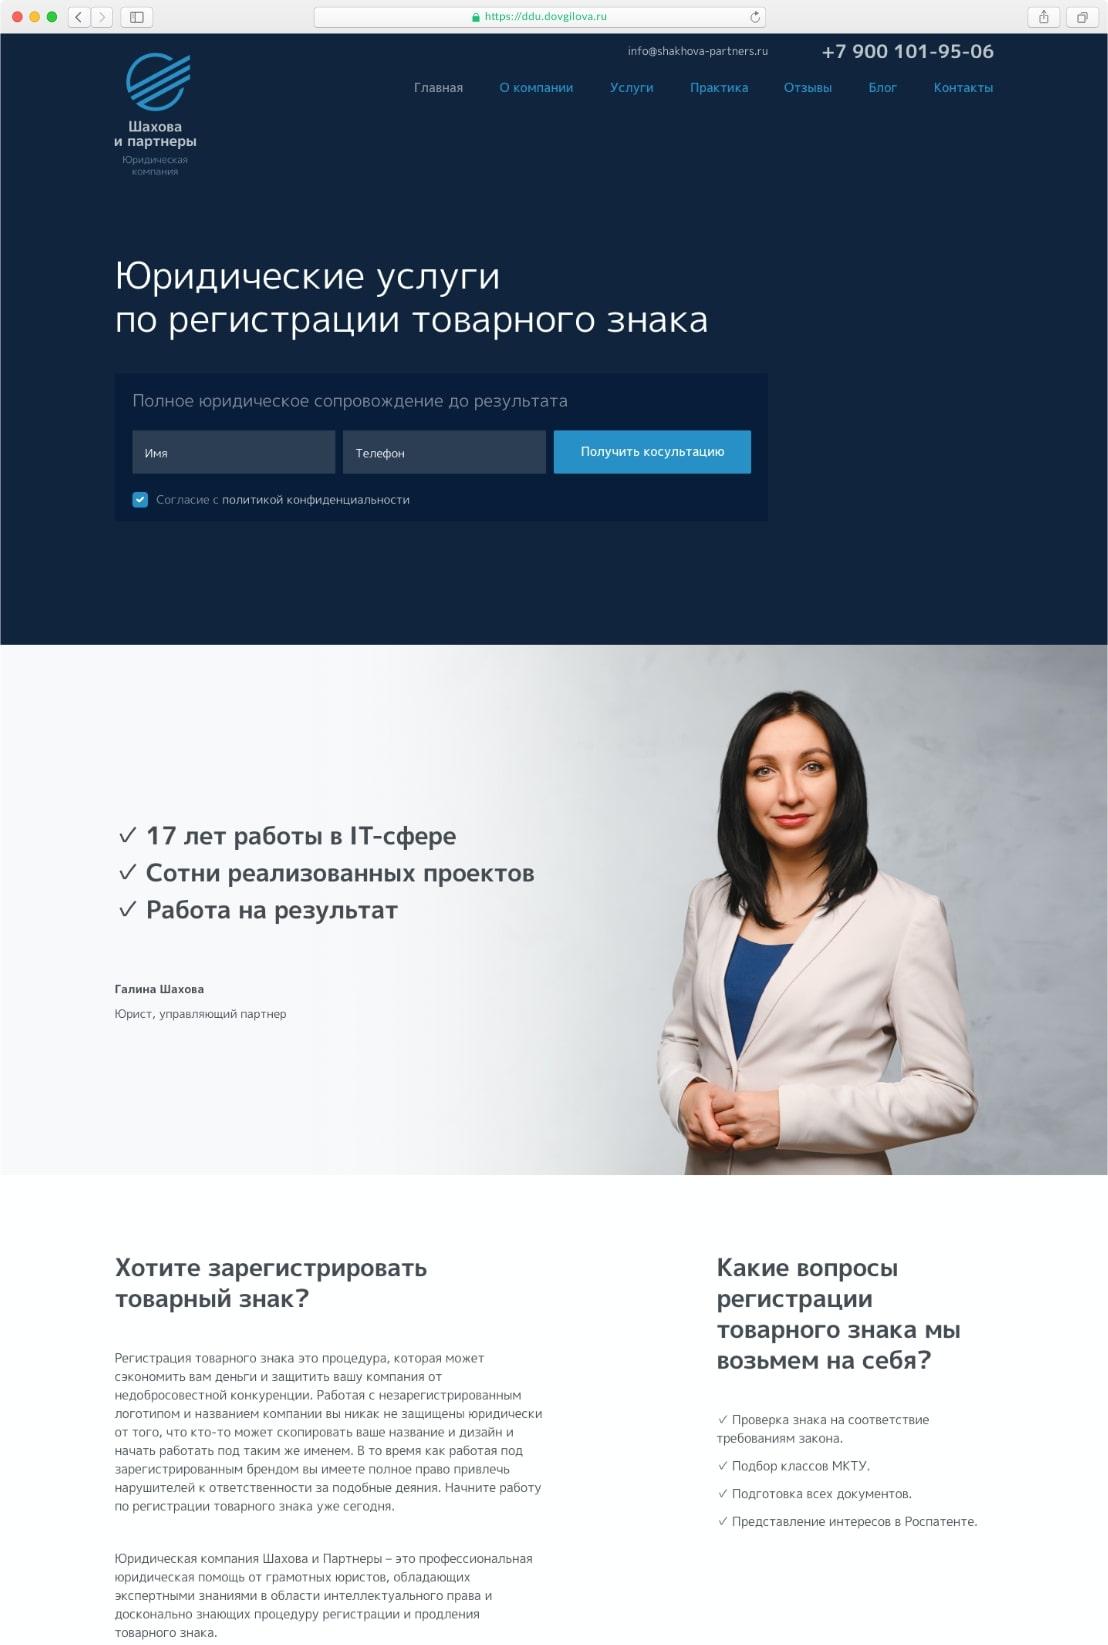 case_shakhova_sitepage_3-min